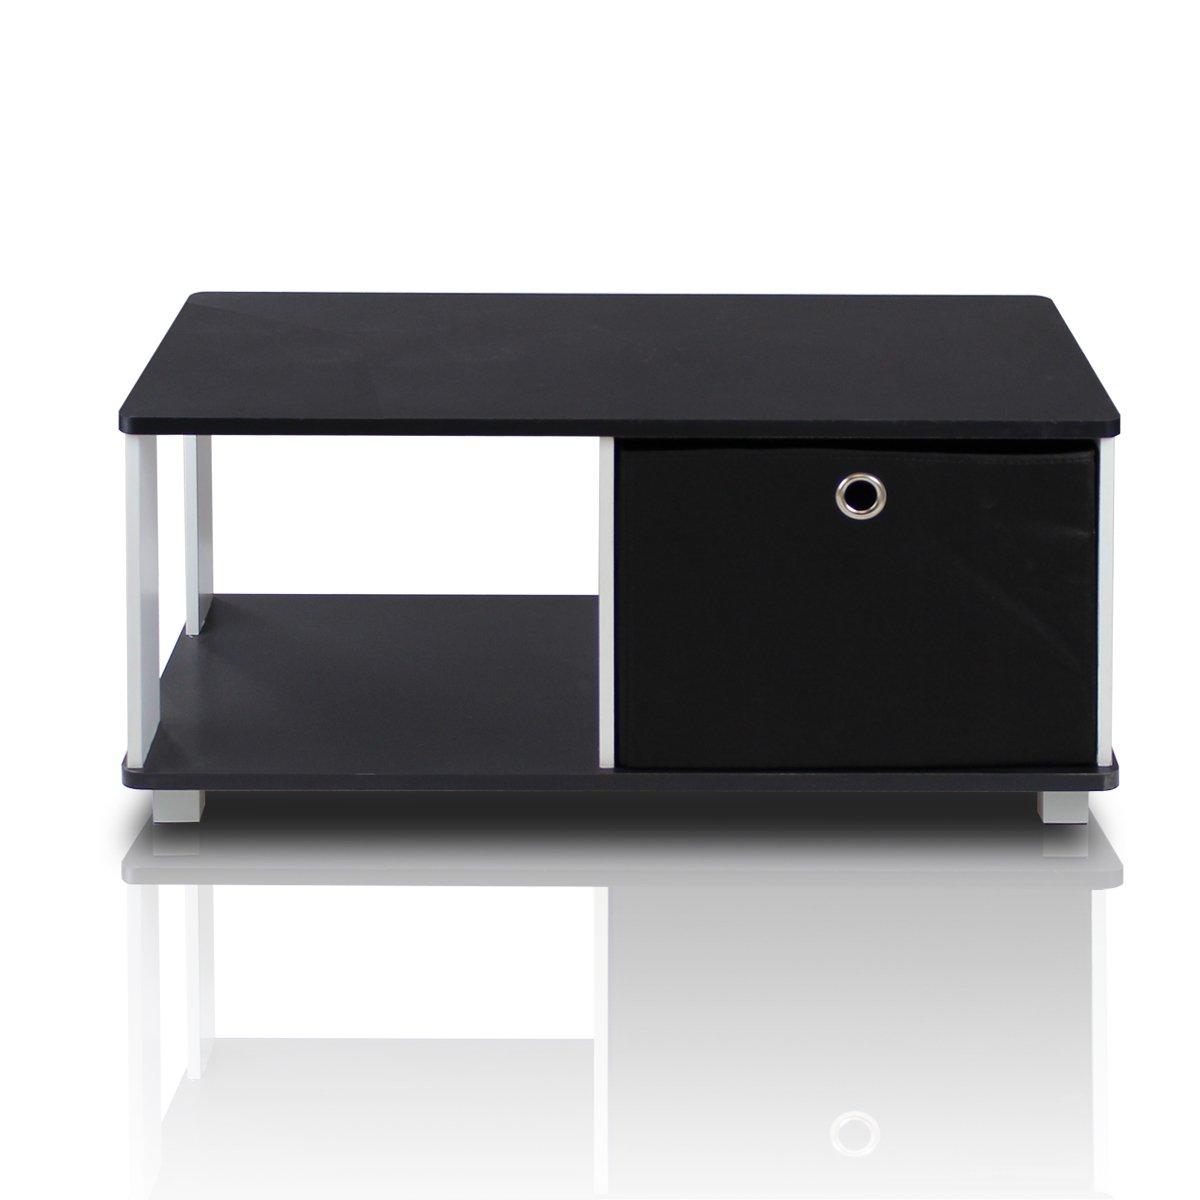 Amazoncom Furinno BKBK Coffee Table With Bin Drawer Black - Furinno coffee table